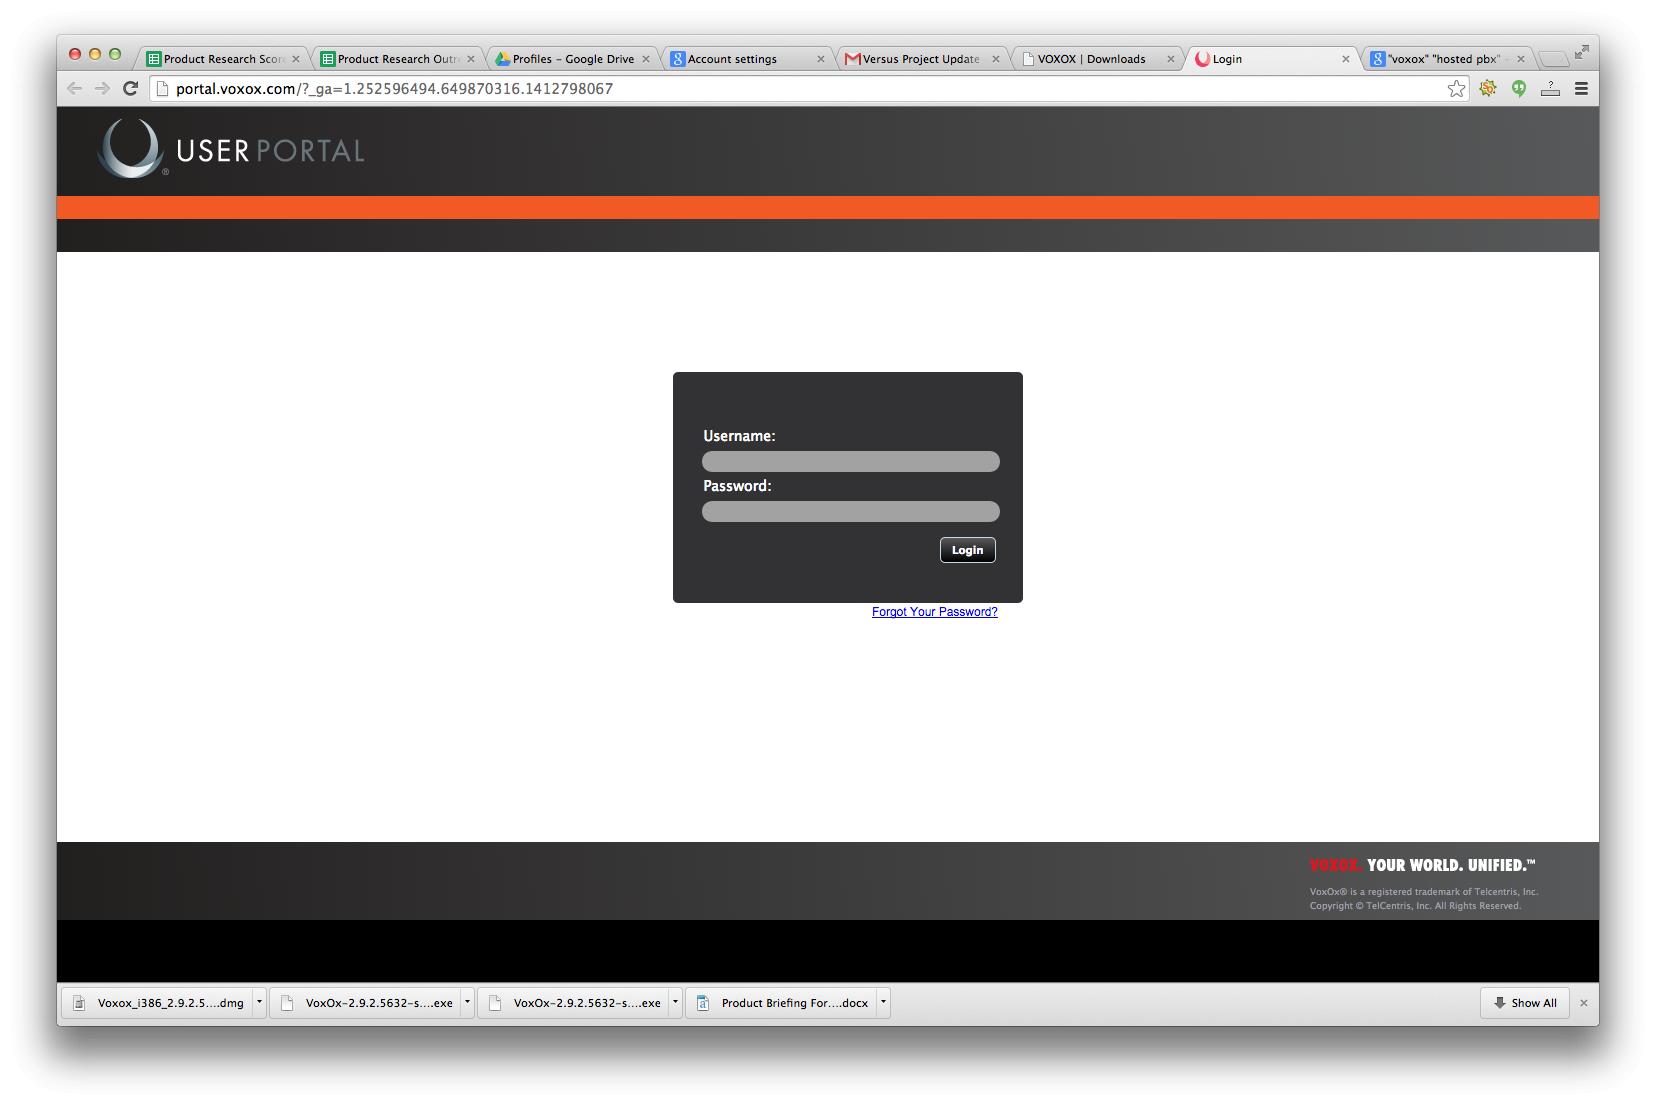 User portal login